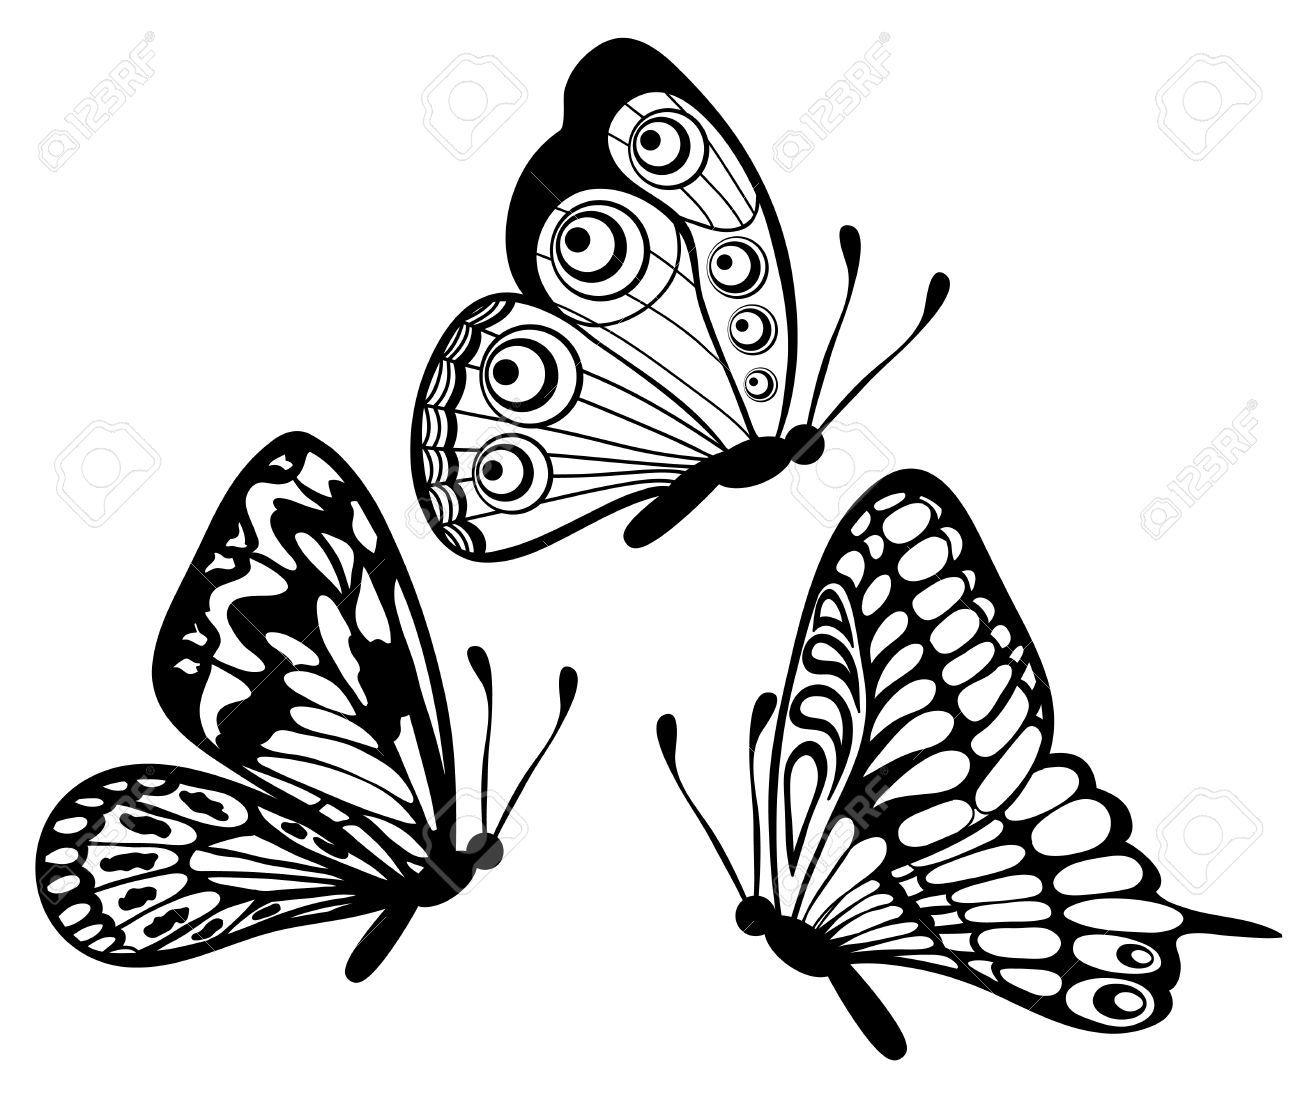 Monarch Butterfly Flying Stock Illustrations Cliparts And Royalty Kelebekler Siyah Ve Beyaz Siyah